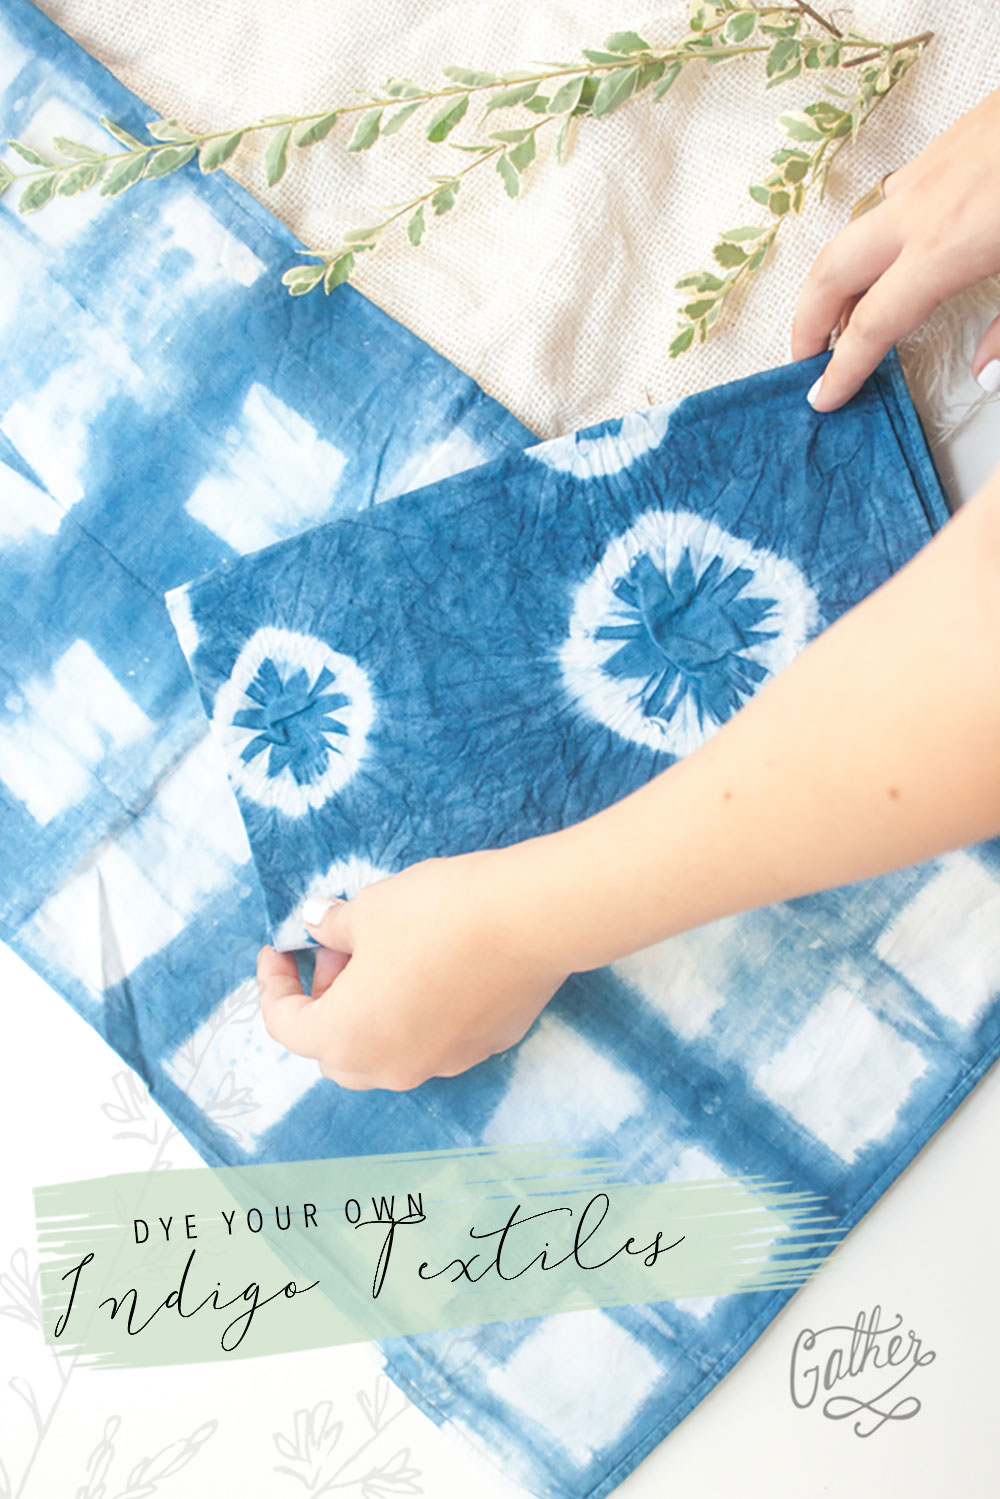 Indigo Shibori Textiles Class | Gather Goods Co